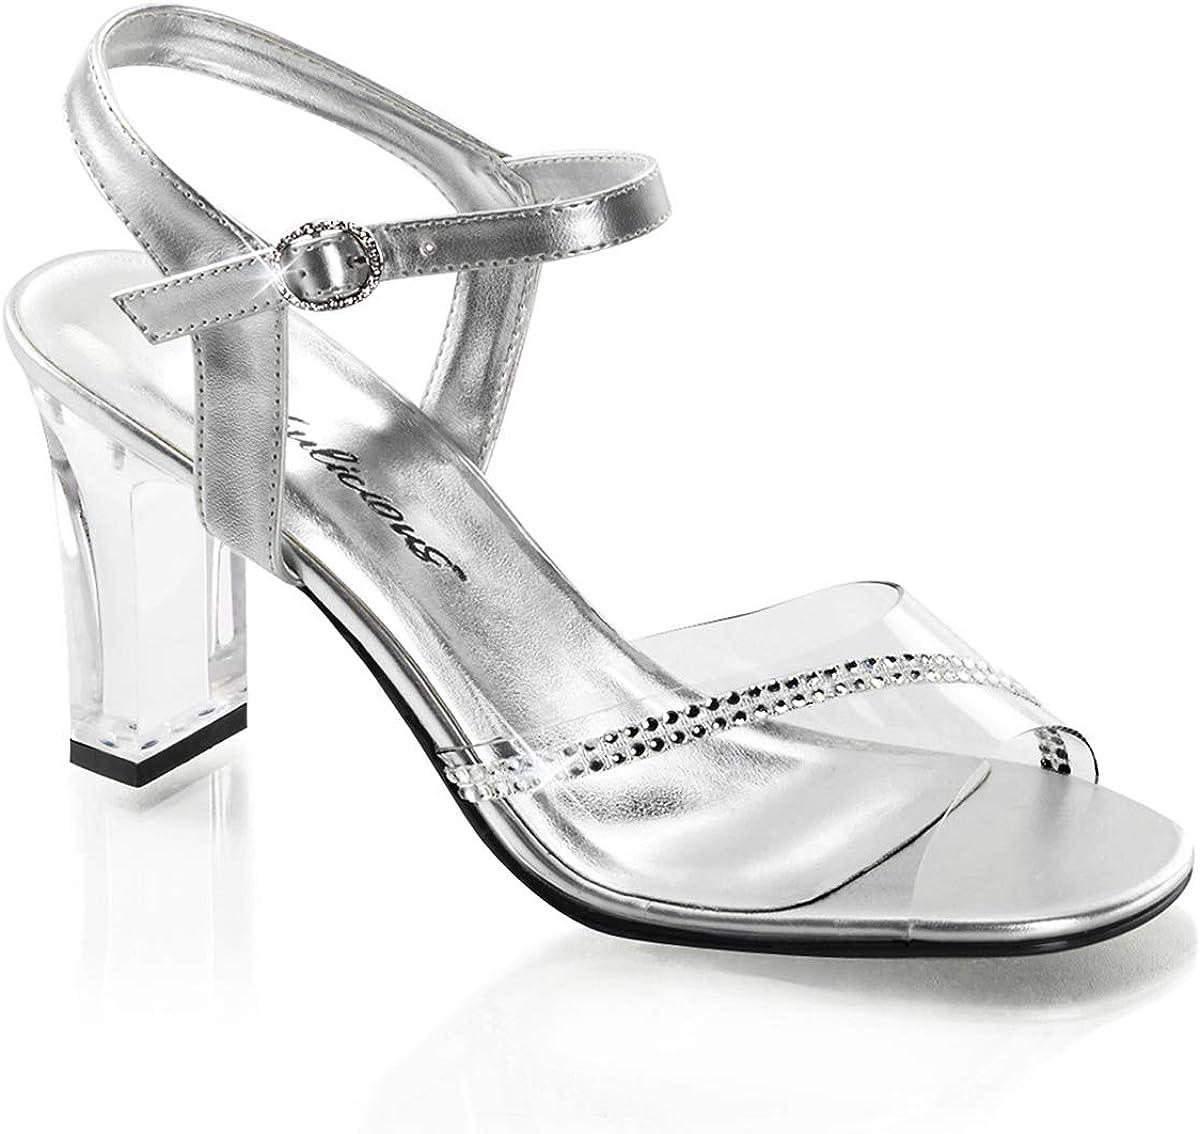 Pleaser ROMANCE-308R Womens Shoes